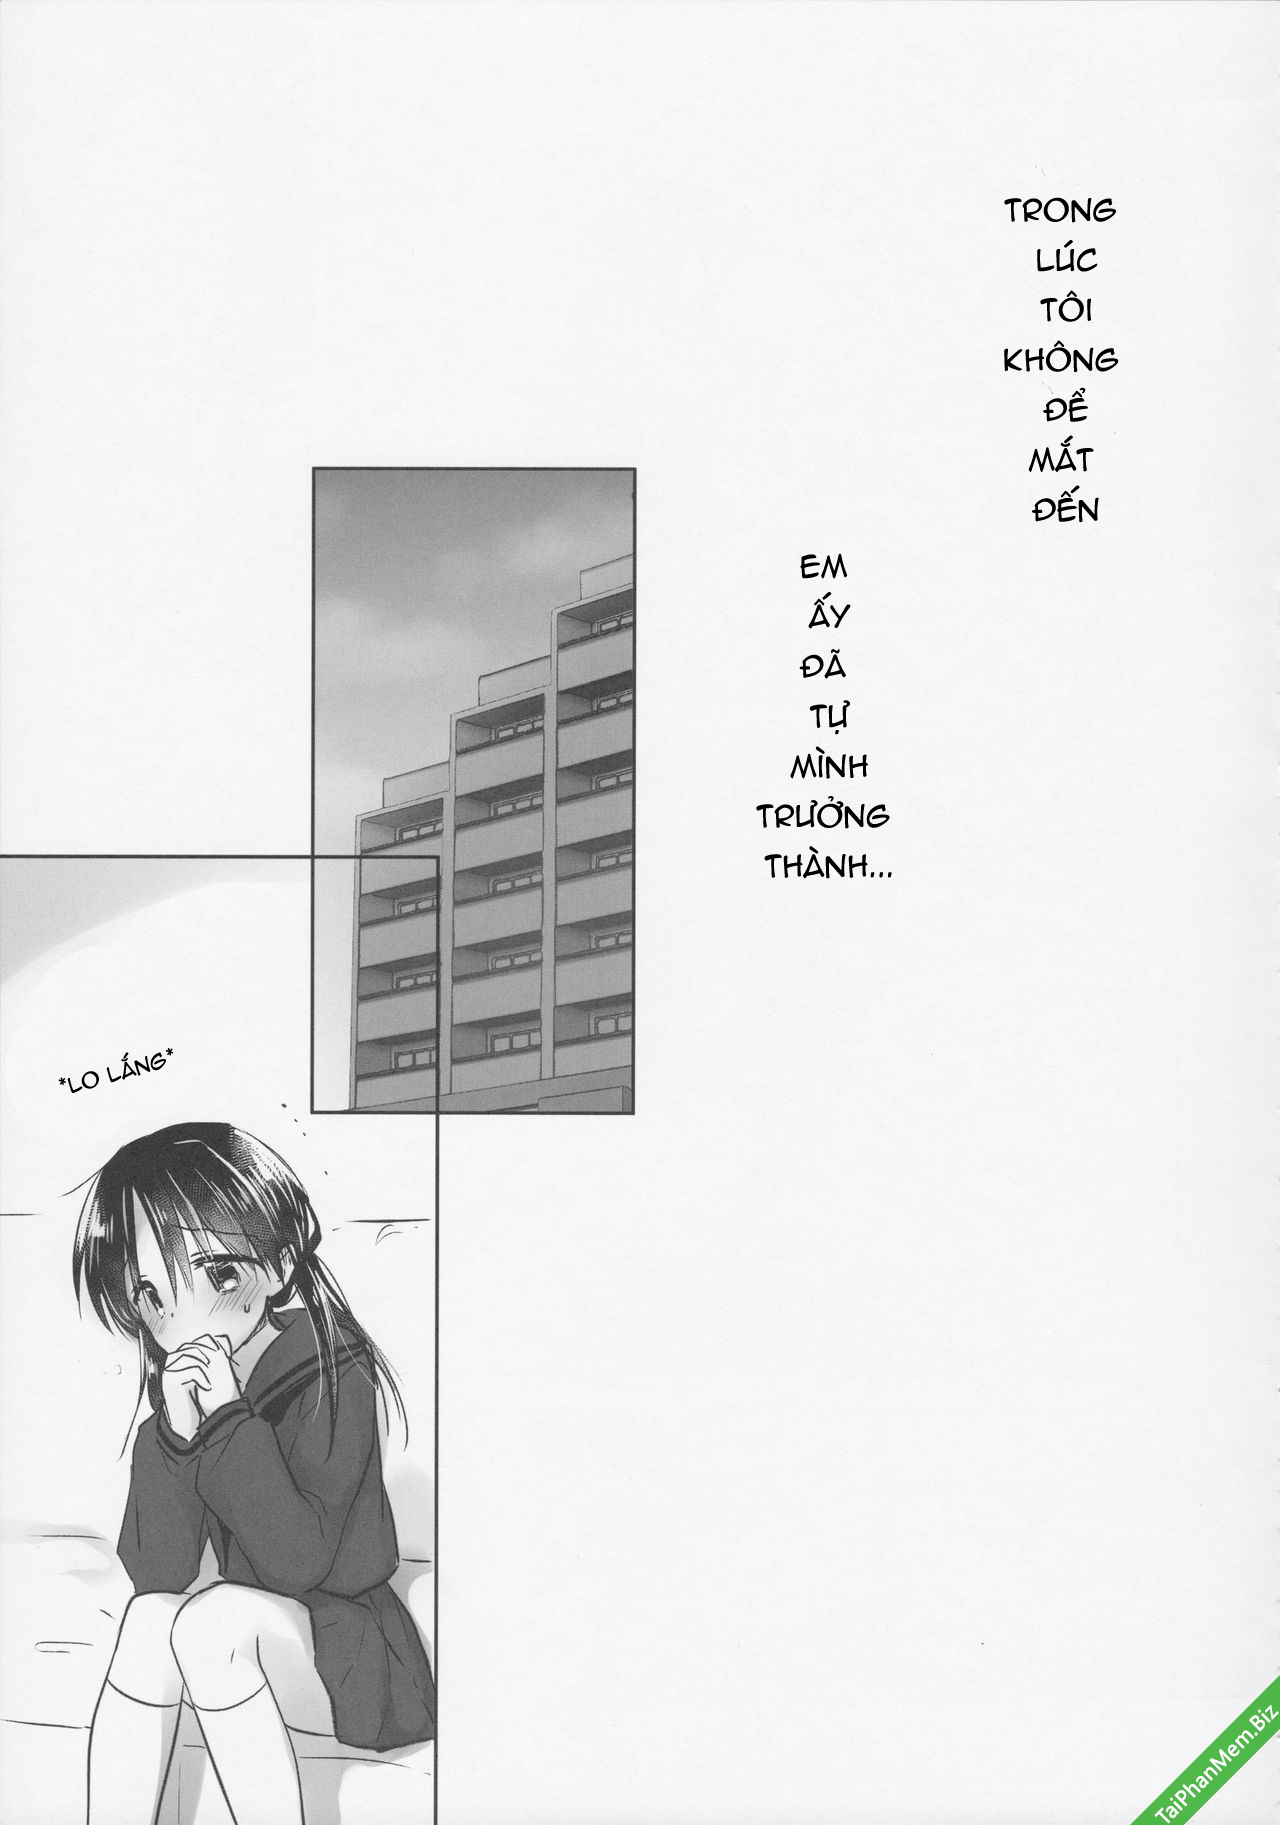 HentaiVN.net - Ảnh 43 - Omocha Sex - Chap 5